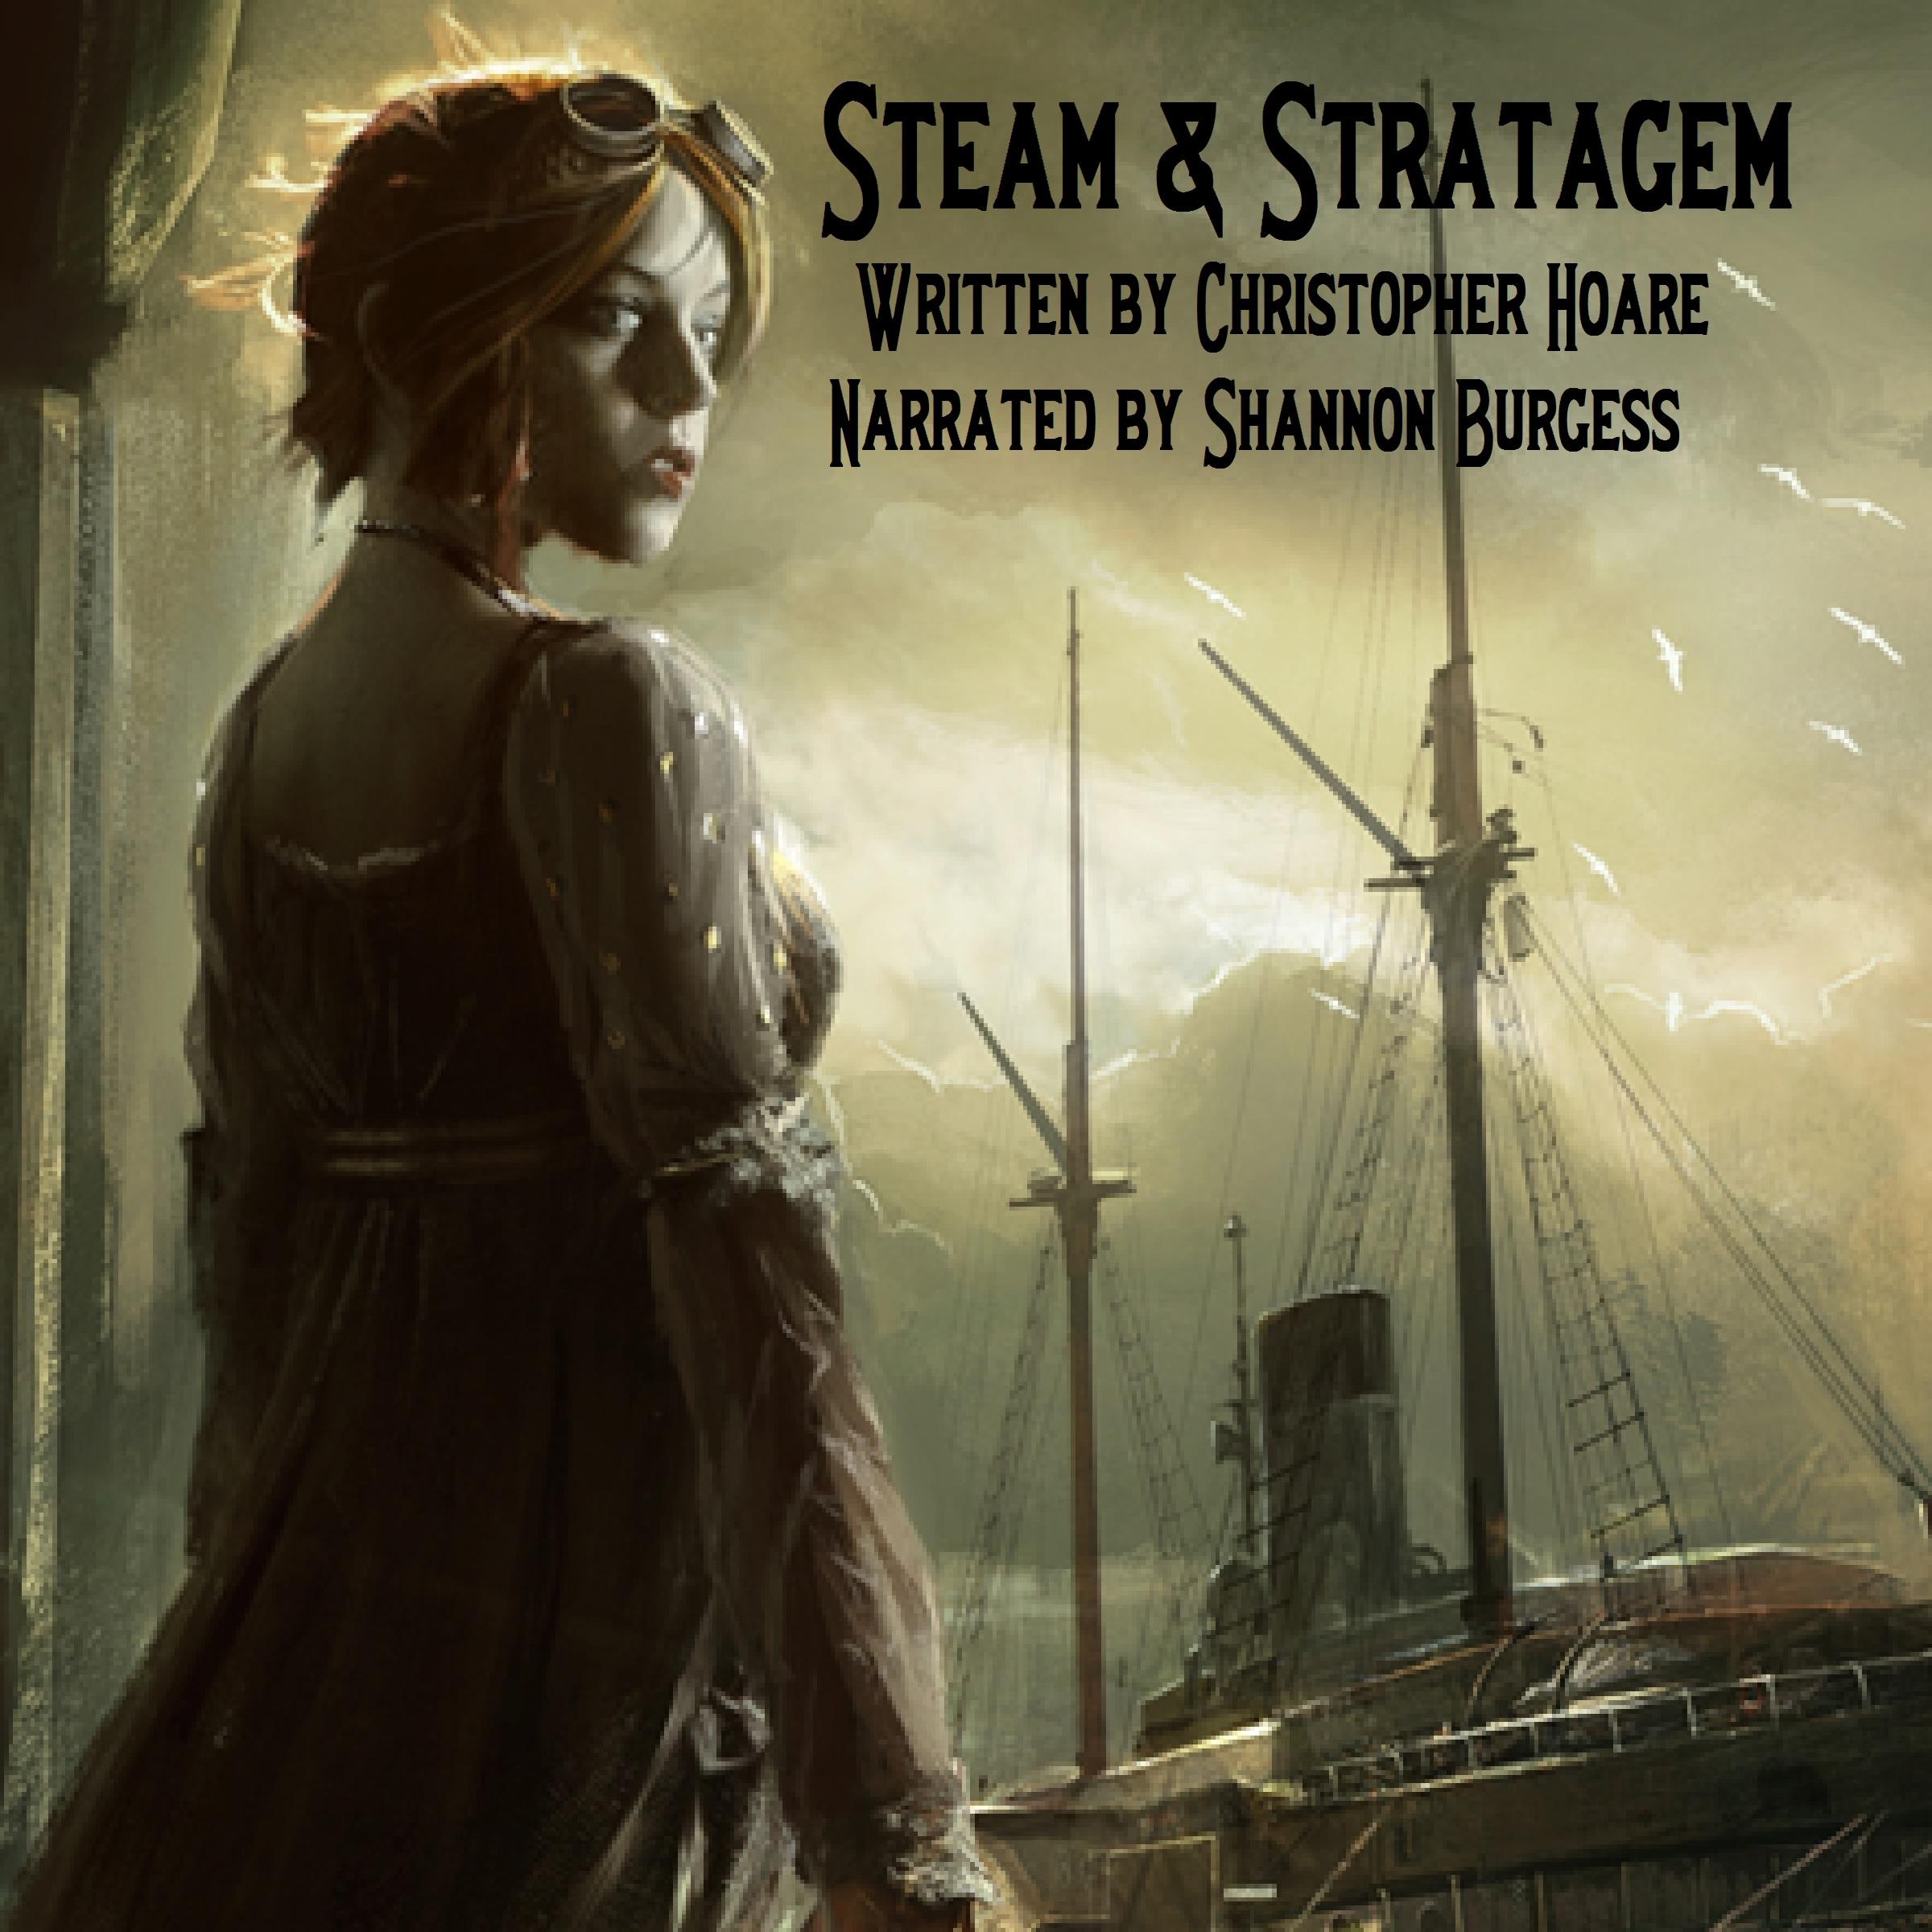 Steam and Stratagem